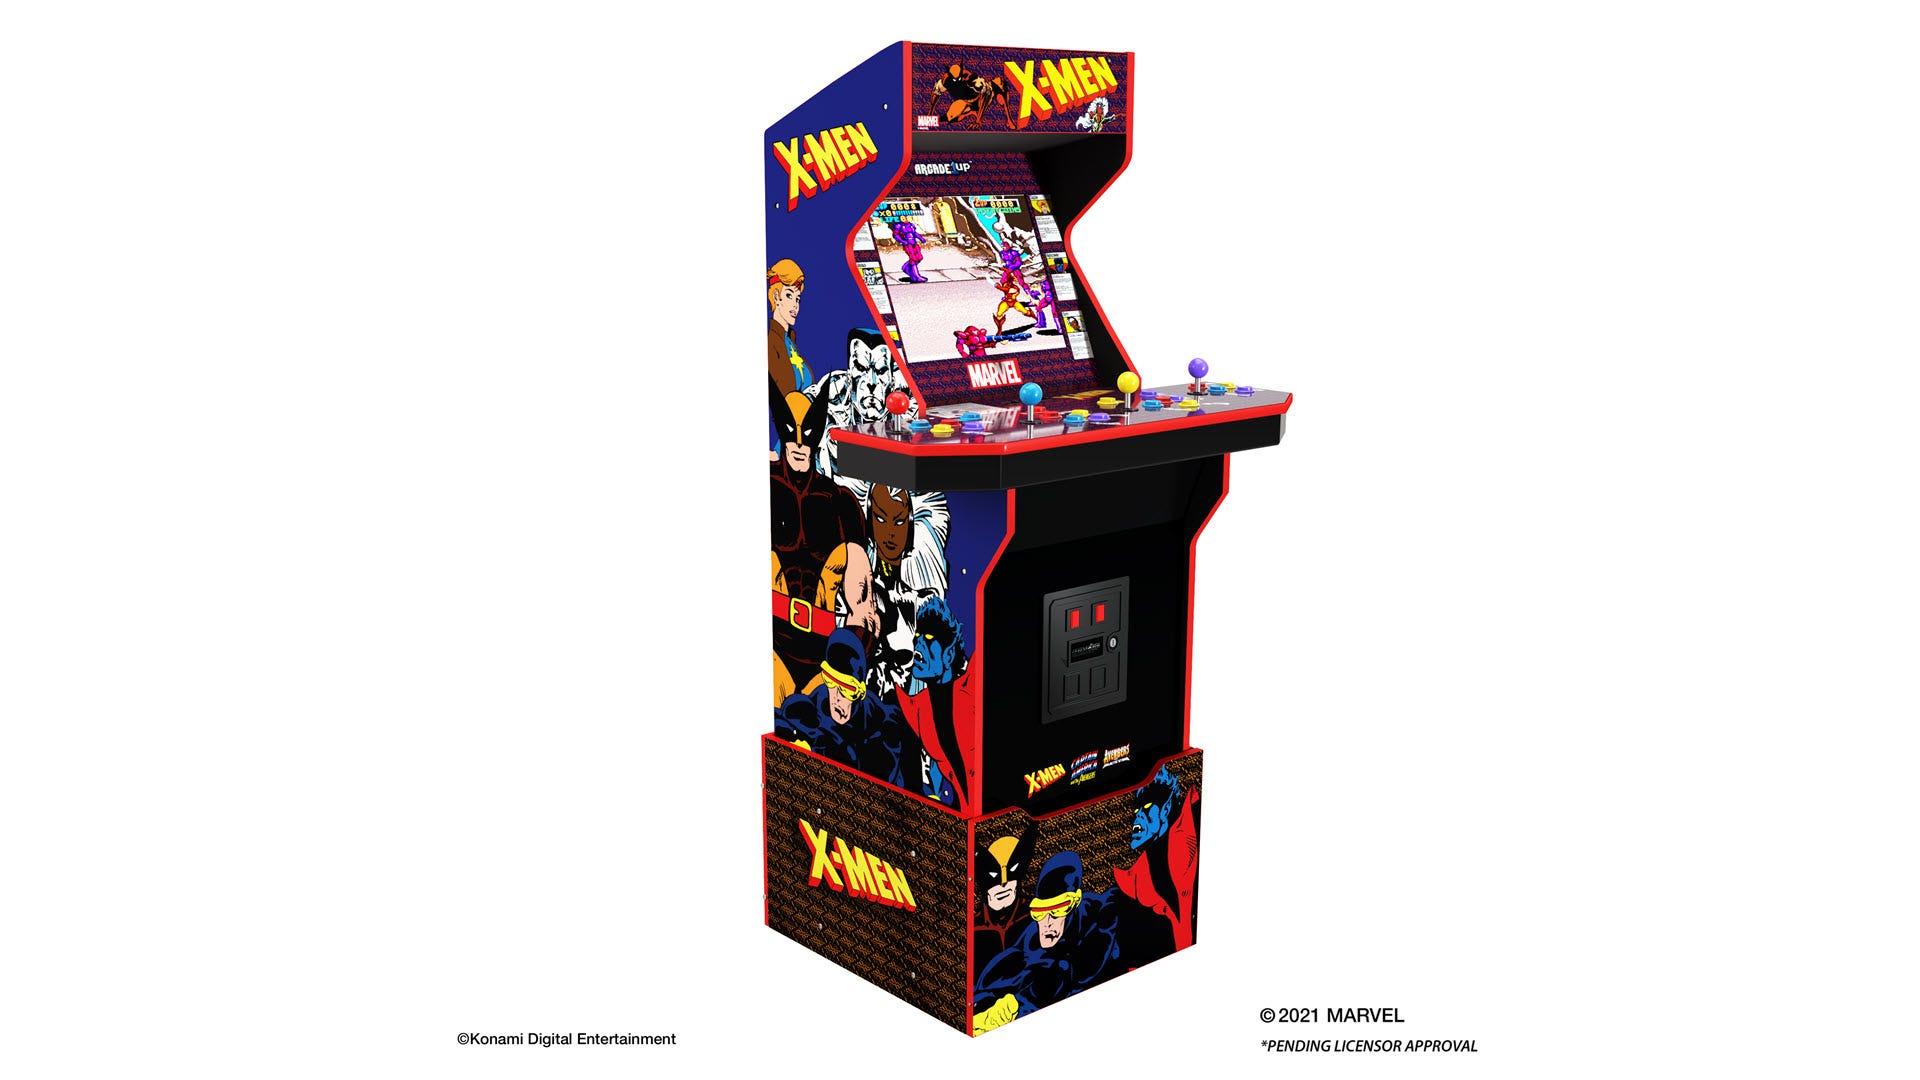 An 'X-Men' arcade machine.